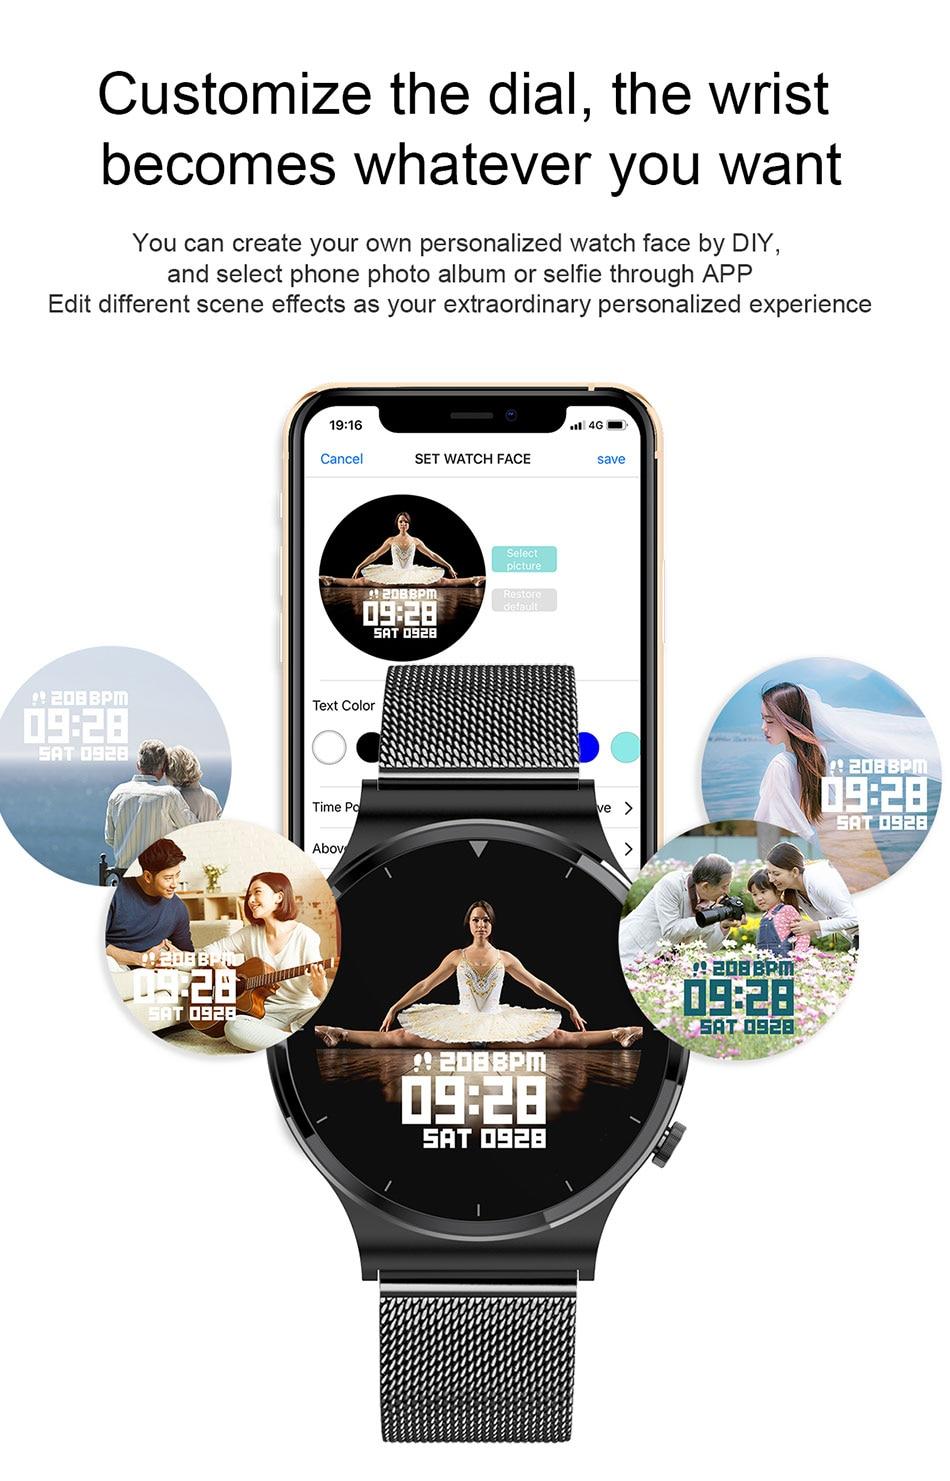 Ha407e48fed904b818b053c9b115ad47ef LIGE 2021 New Smart watch Men IP68 waterproof watch Multiple sports modes heart rate weather Forecast Bluetooth Men Smart watch